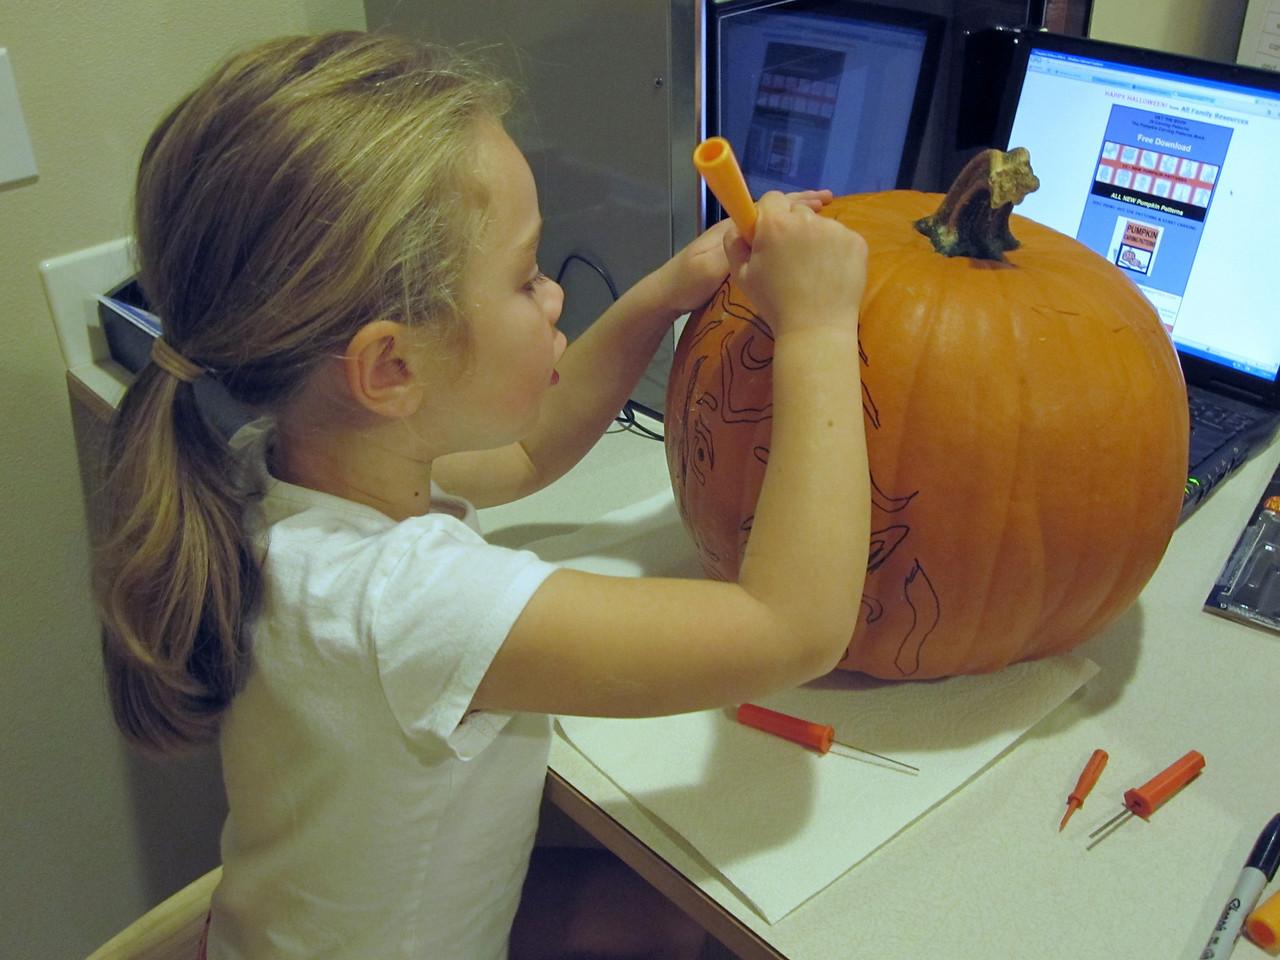 Halloween '09 - Carving pumpkins